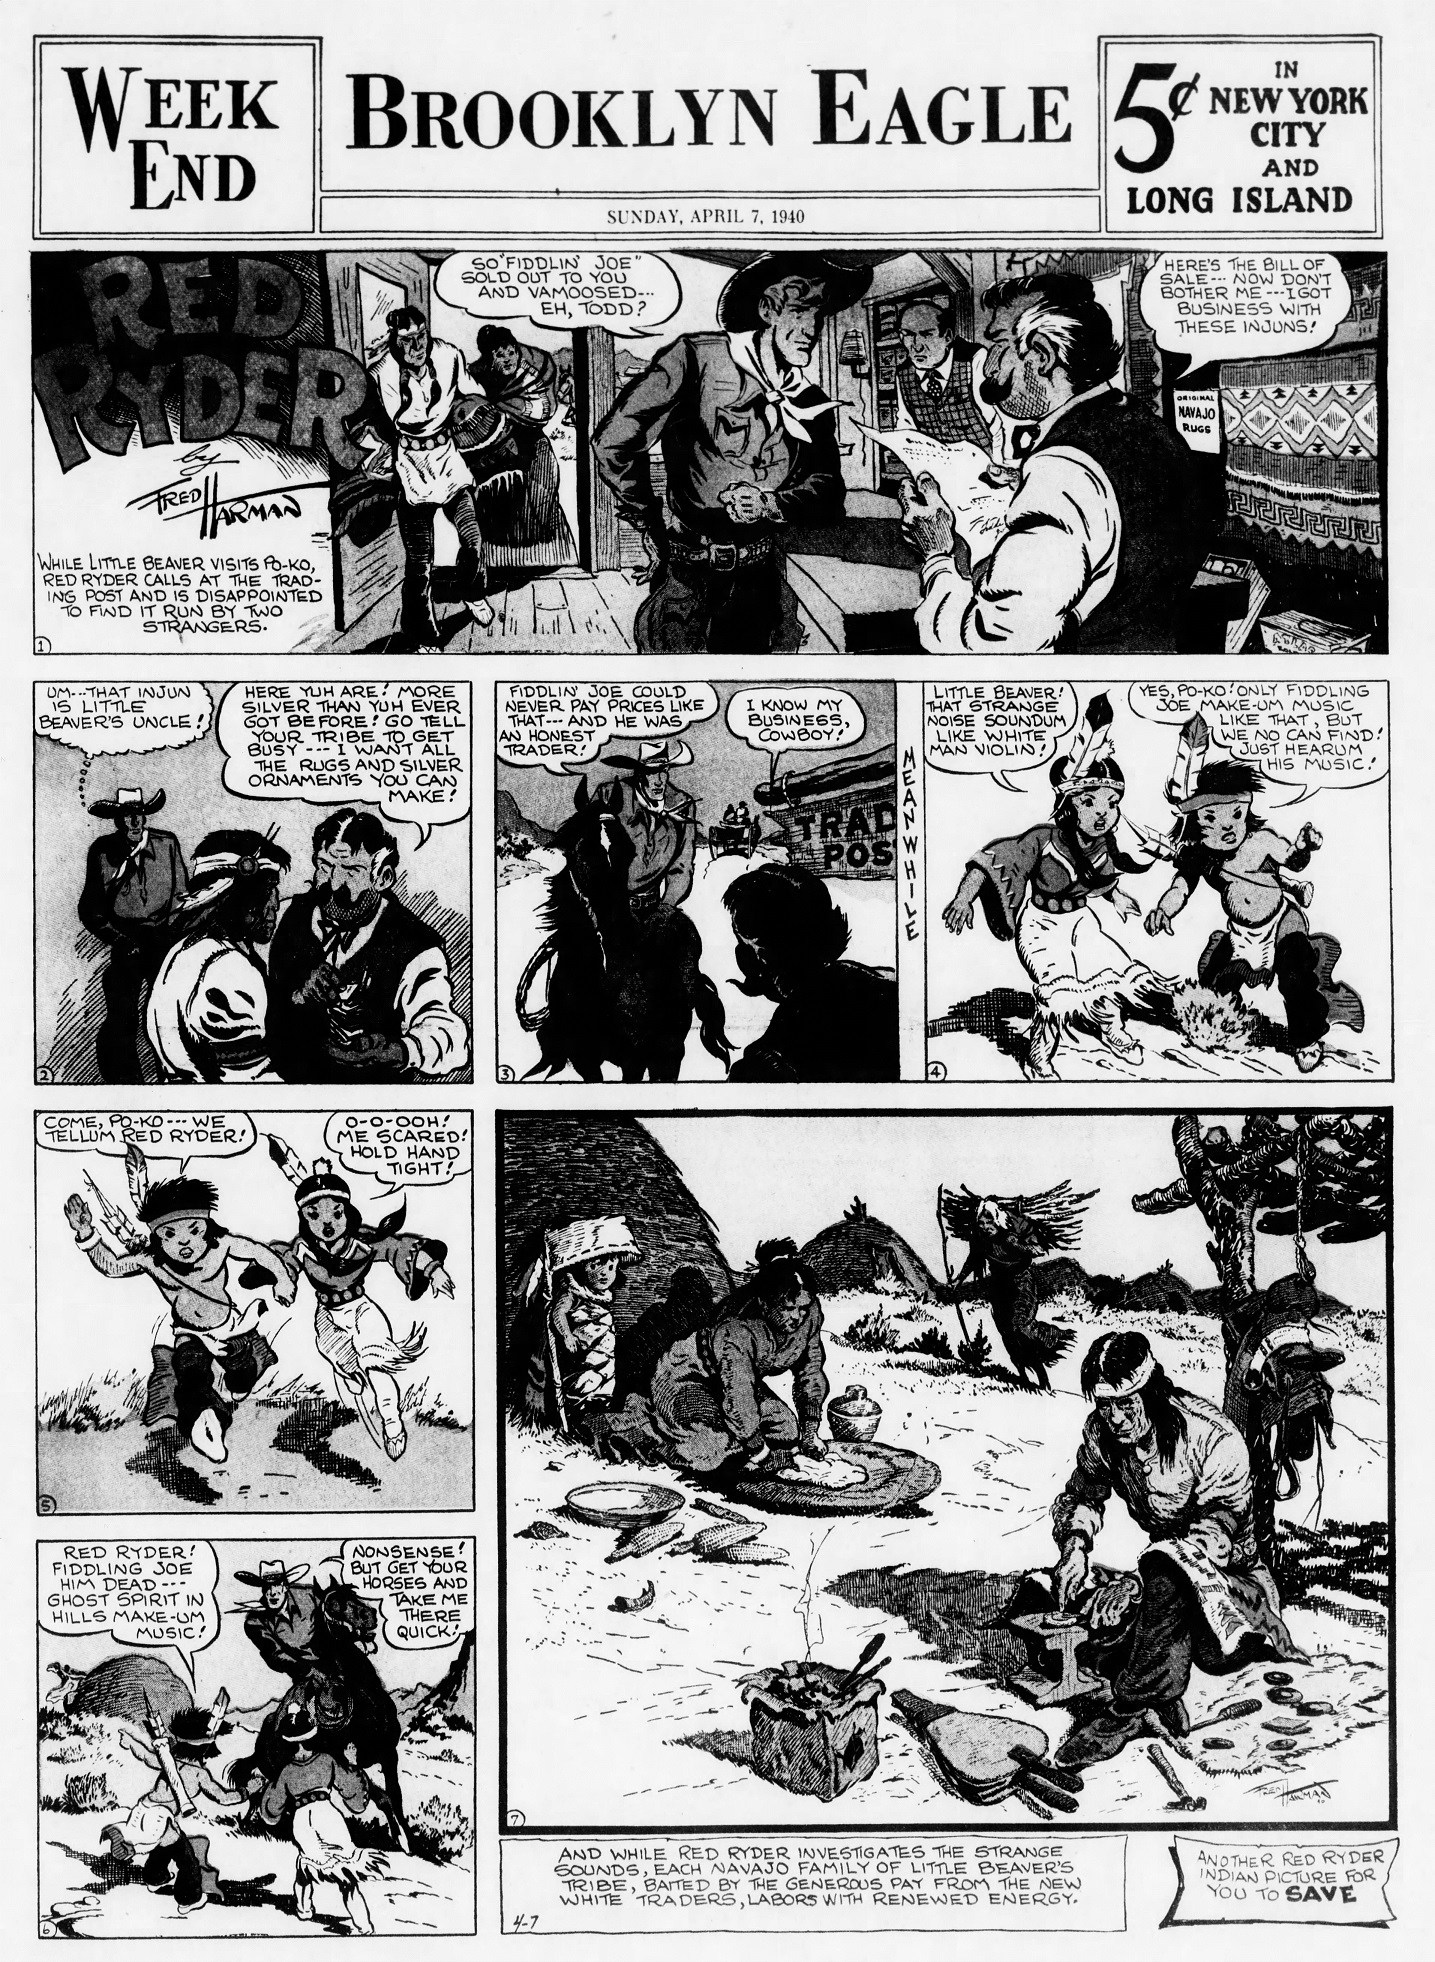 The_Brooklyn_Daily_Eagle_Sun__Apr_7__1940_(7).jpg